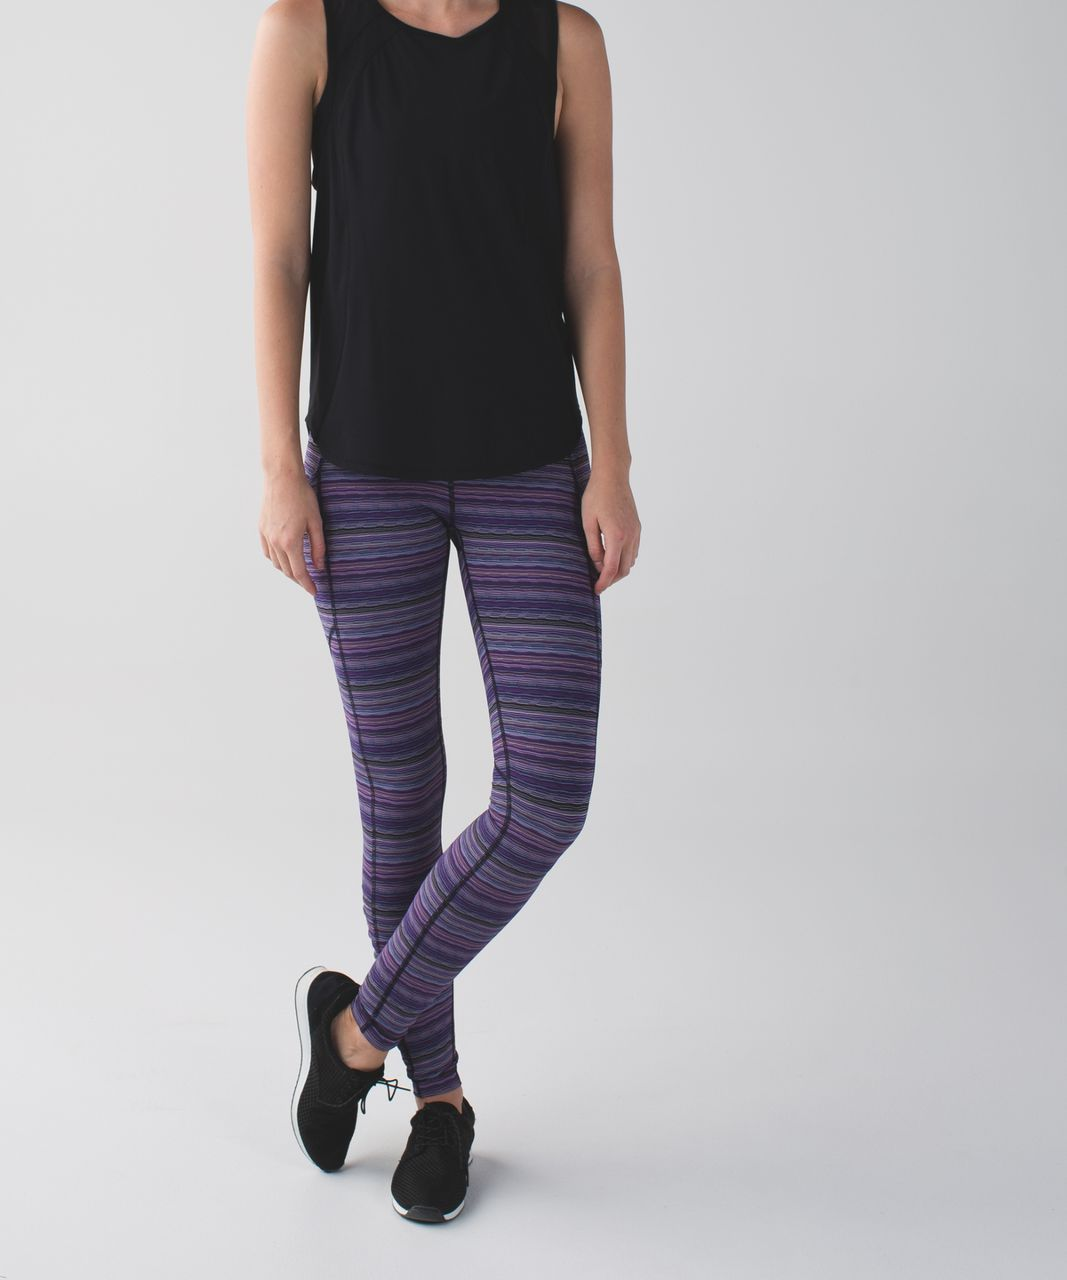 Lululemon Speed Tight IV - Space Dye Twist Ultra Violet Multi / Black